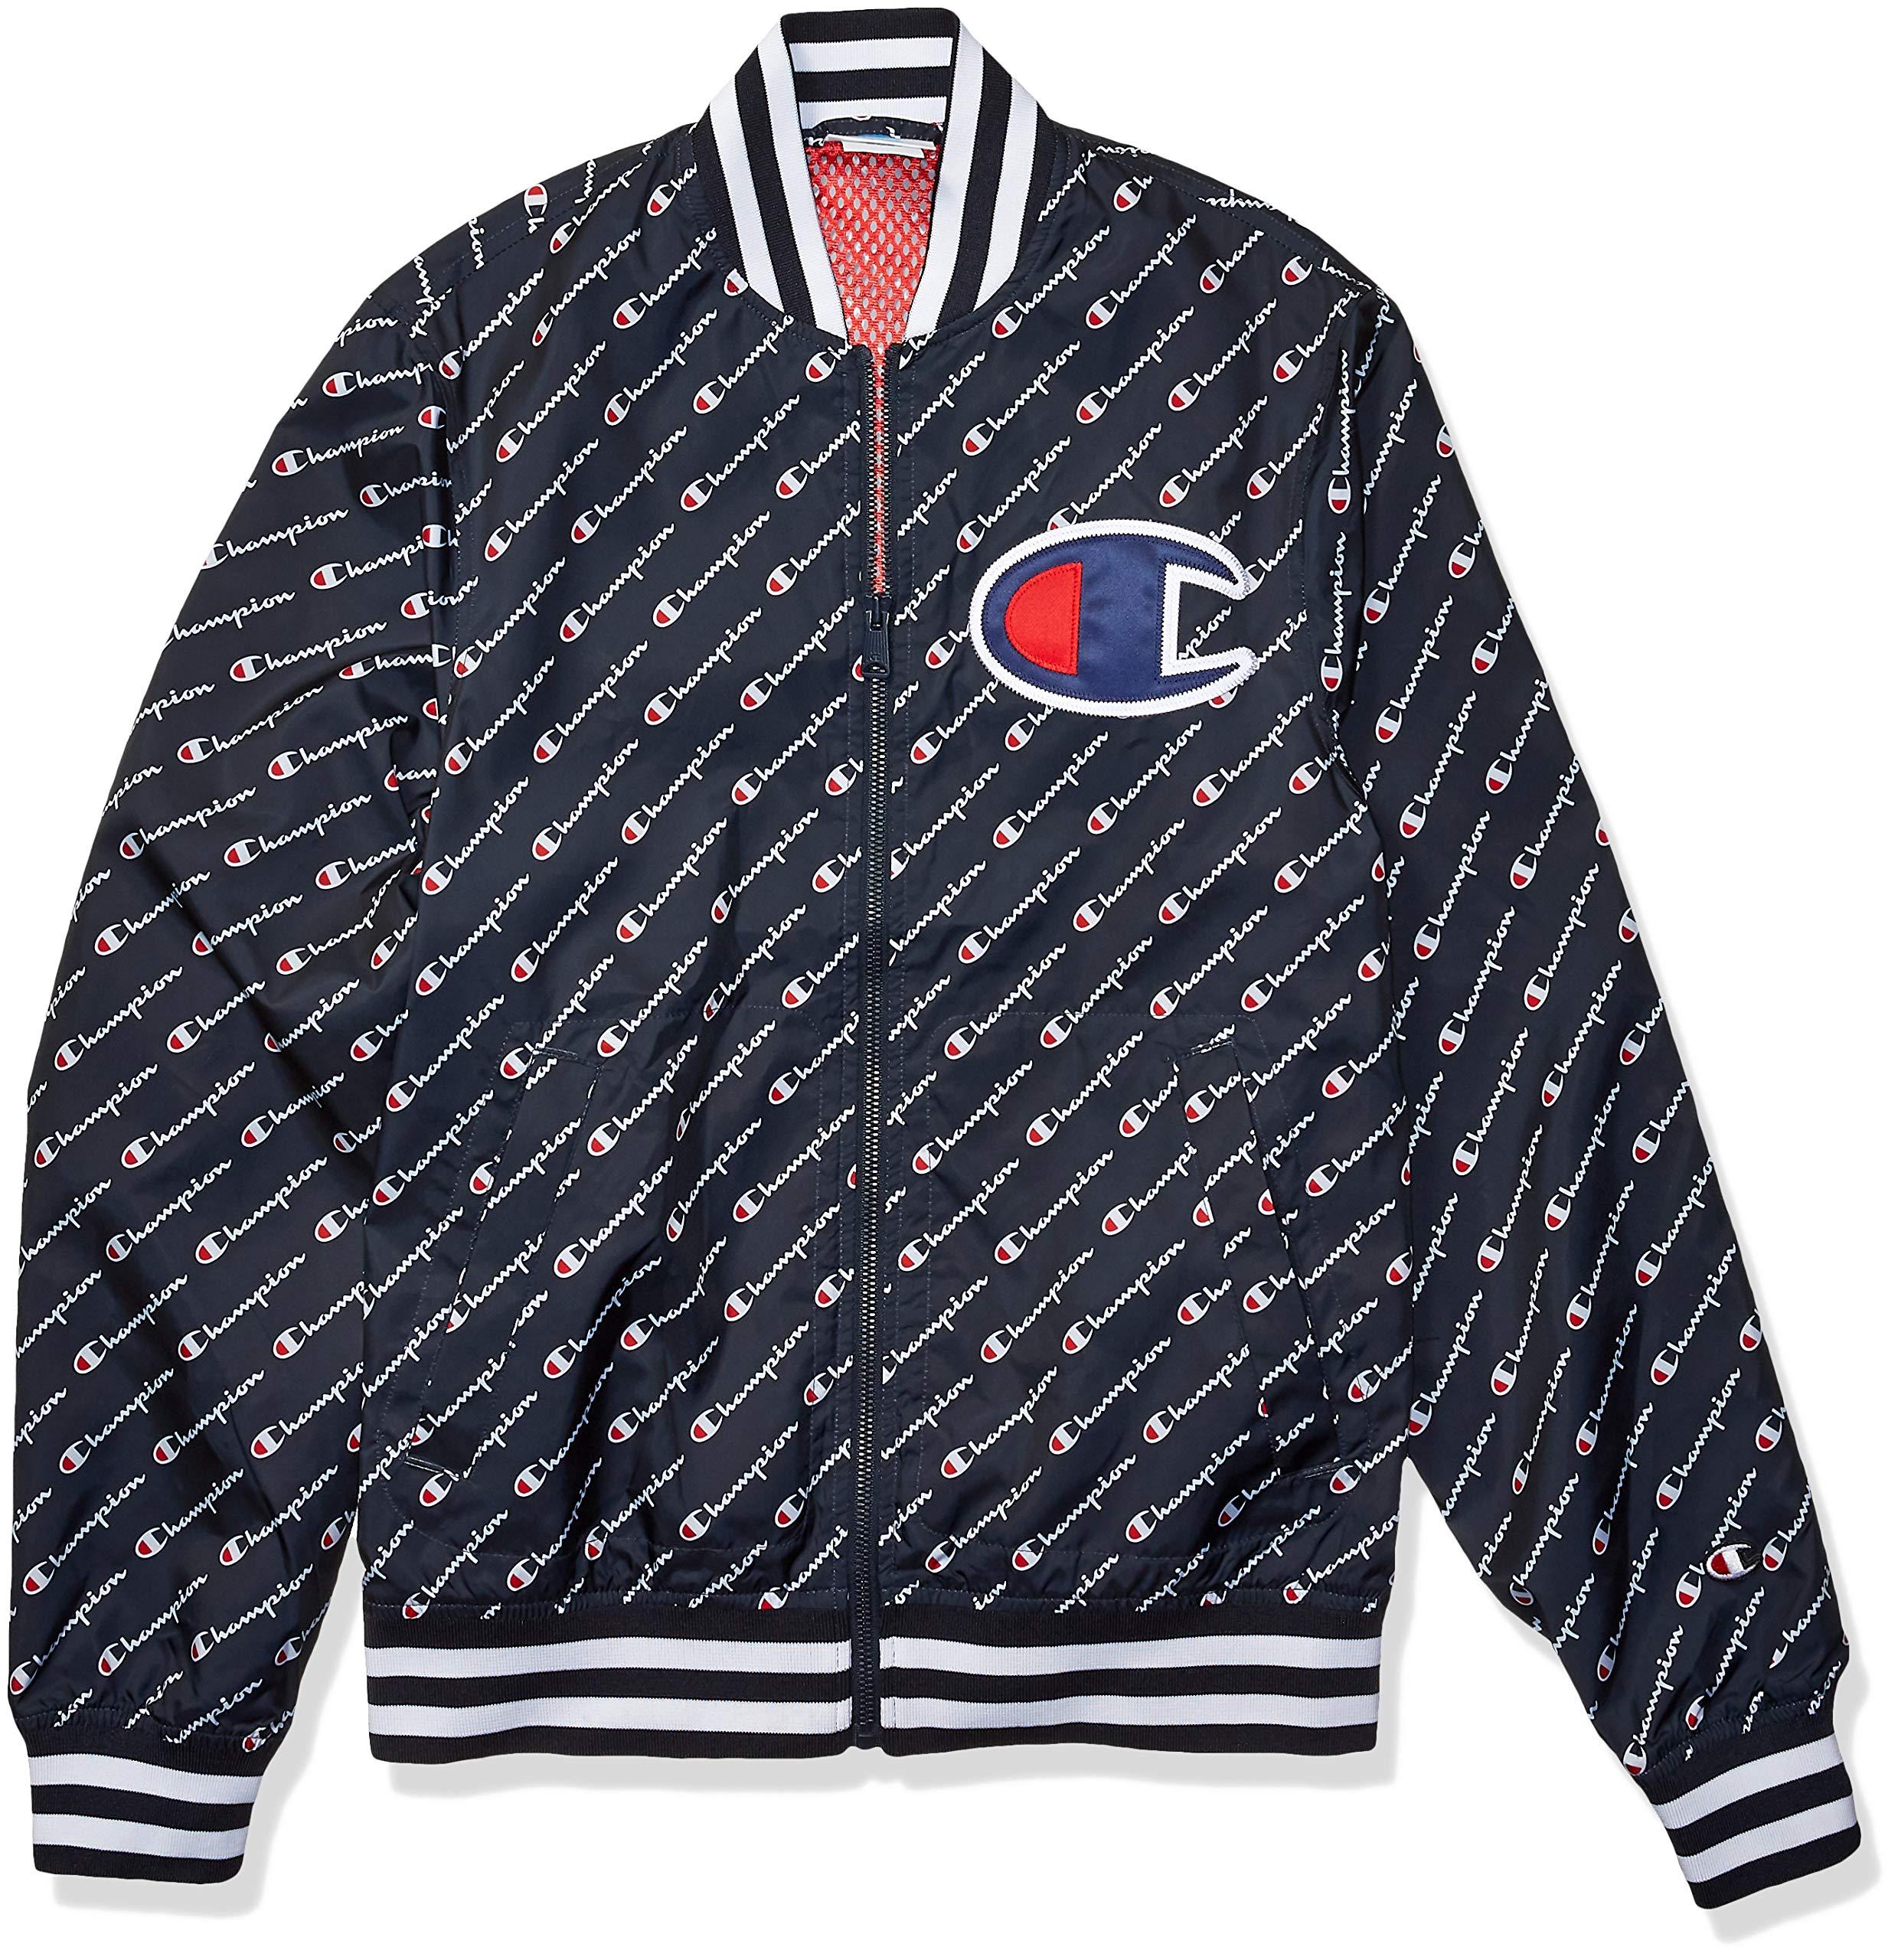 Champion LIFE Men's Satin Baseball Jacket, Diagonal Script Navy, X-Small by Champion LIFE